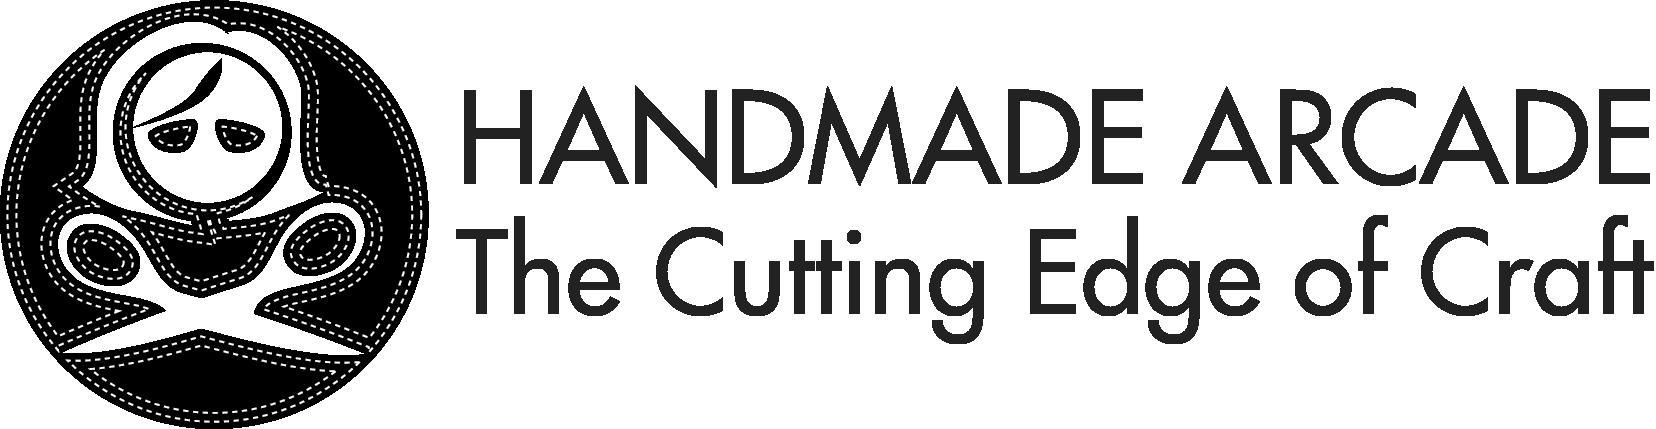 Handmade Arcade.png